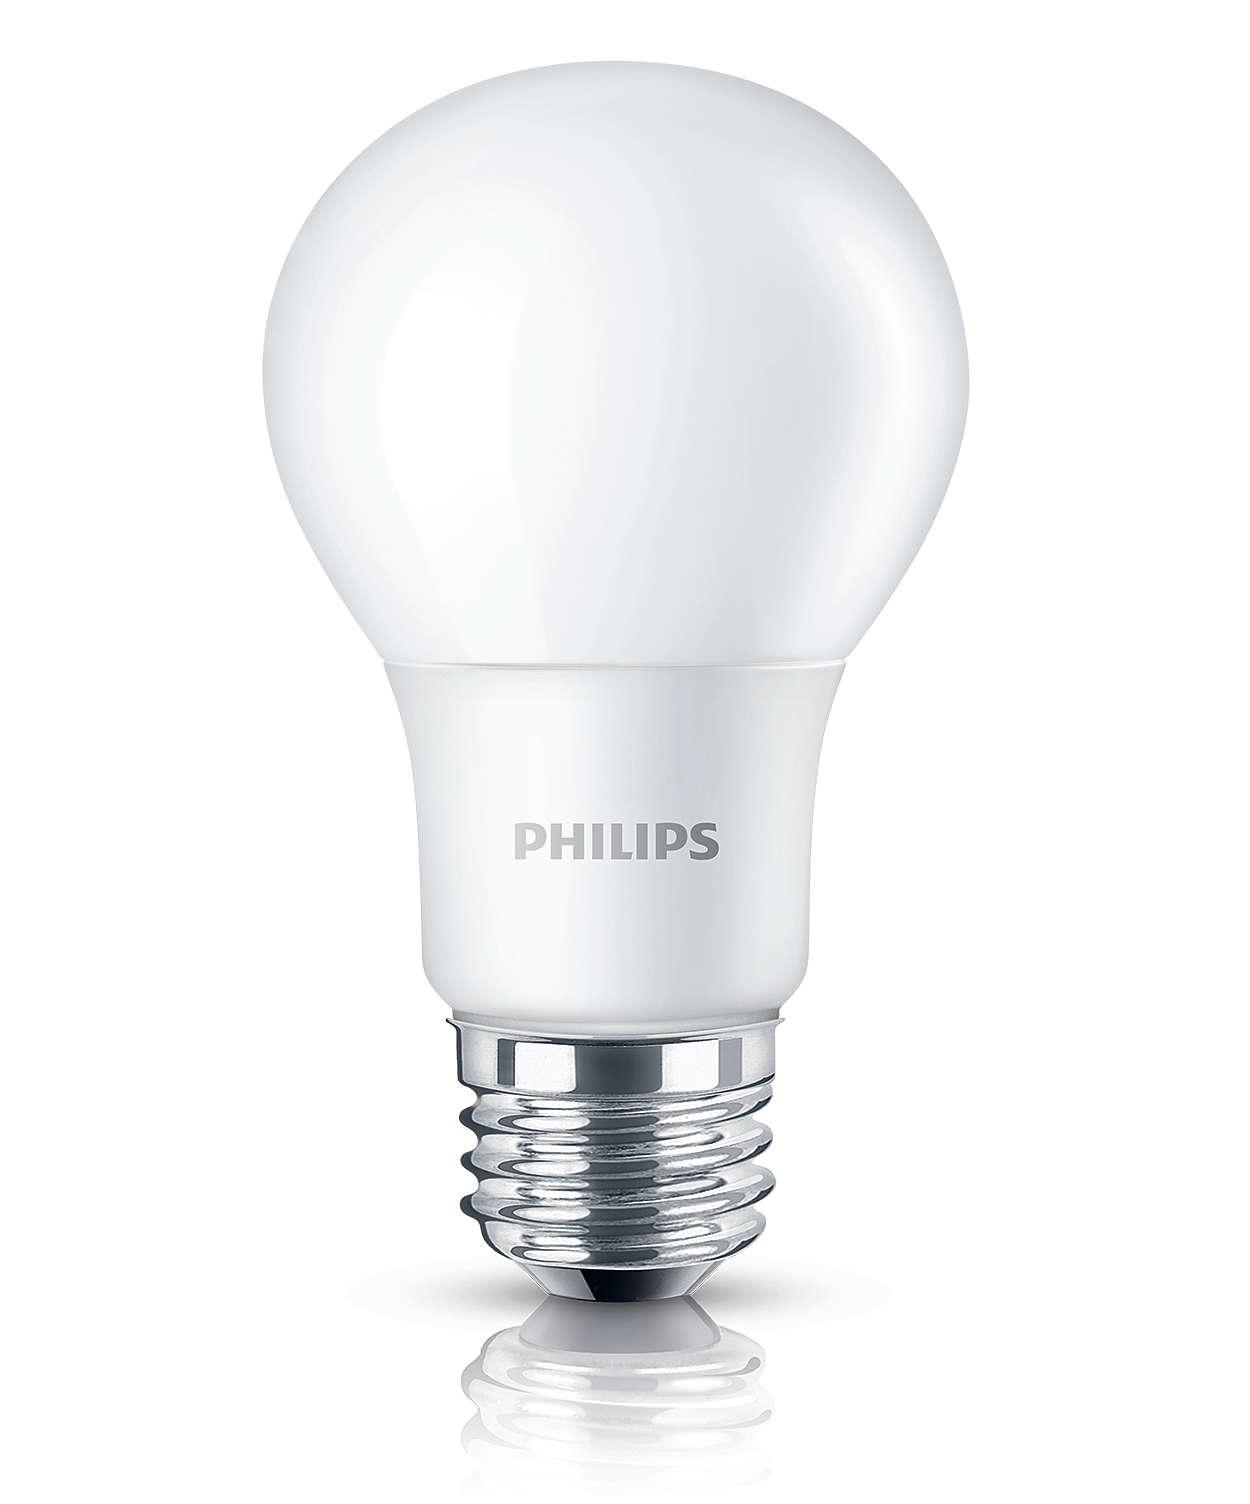 Experience warm white LED light